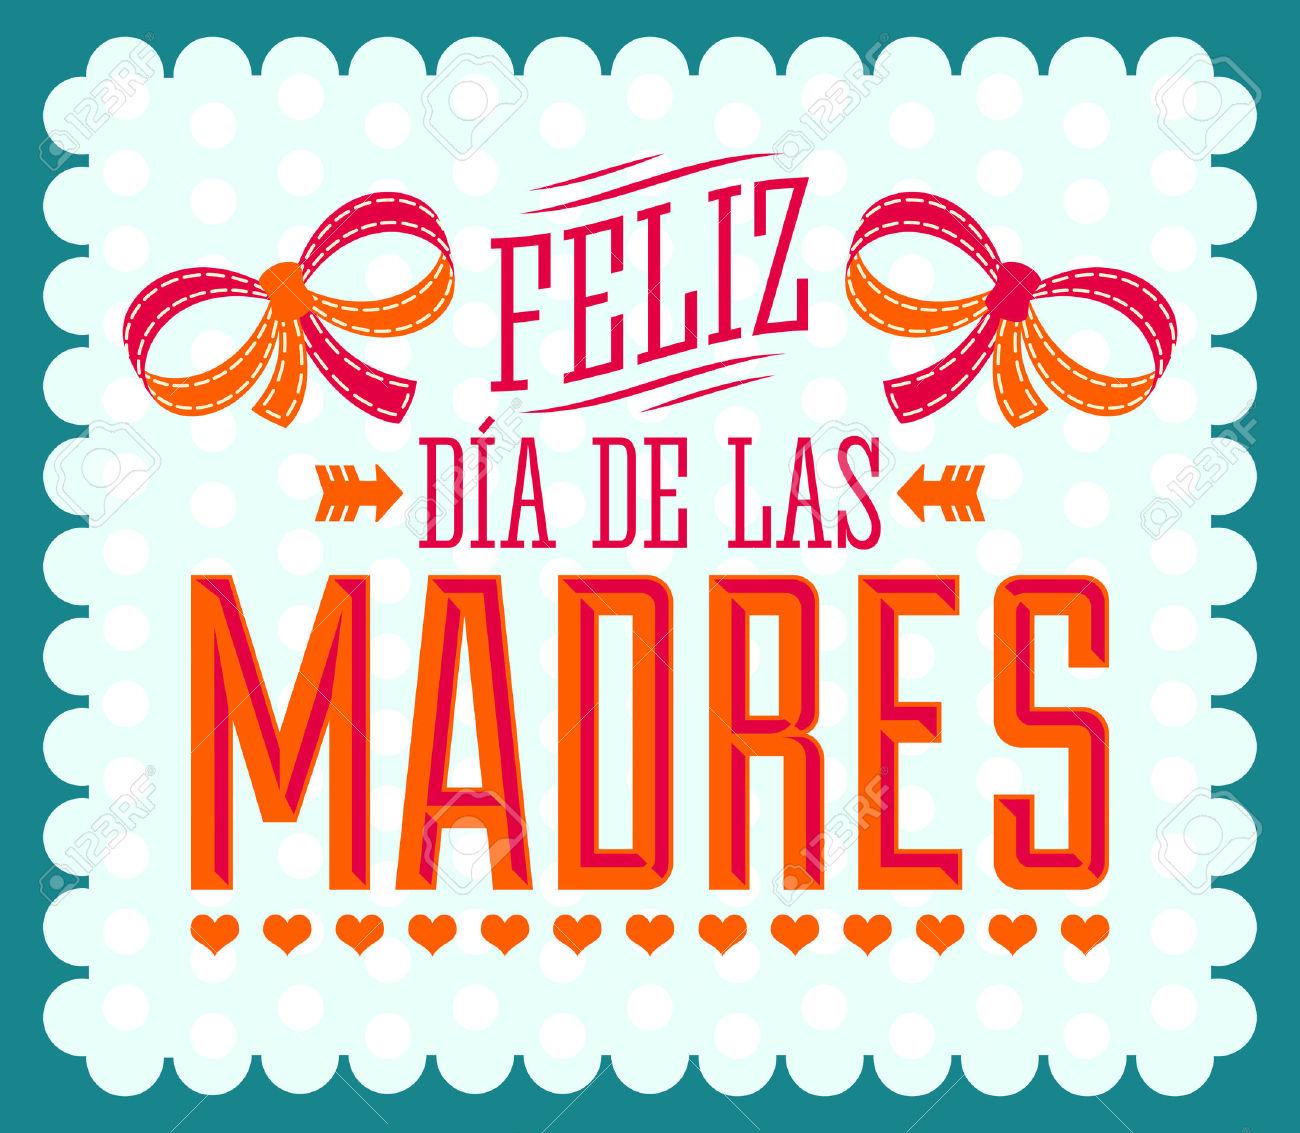 Feliz Dia De Las Madres, Happy Mother S Day Spanish Text Royalty.